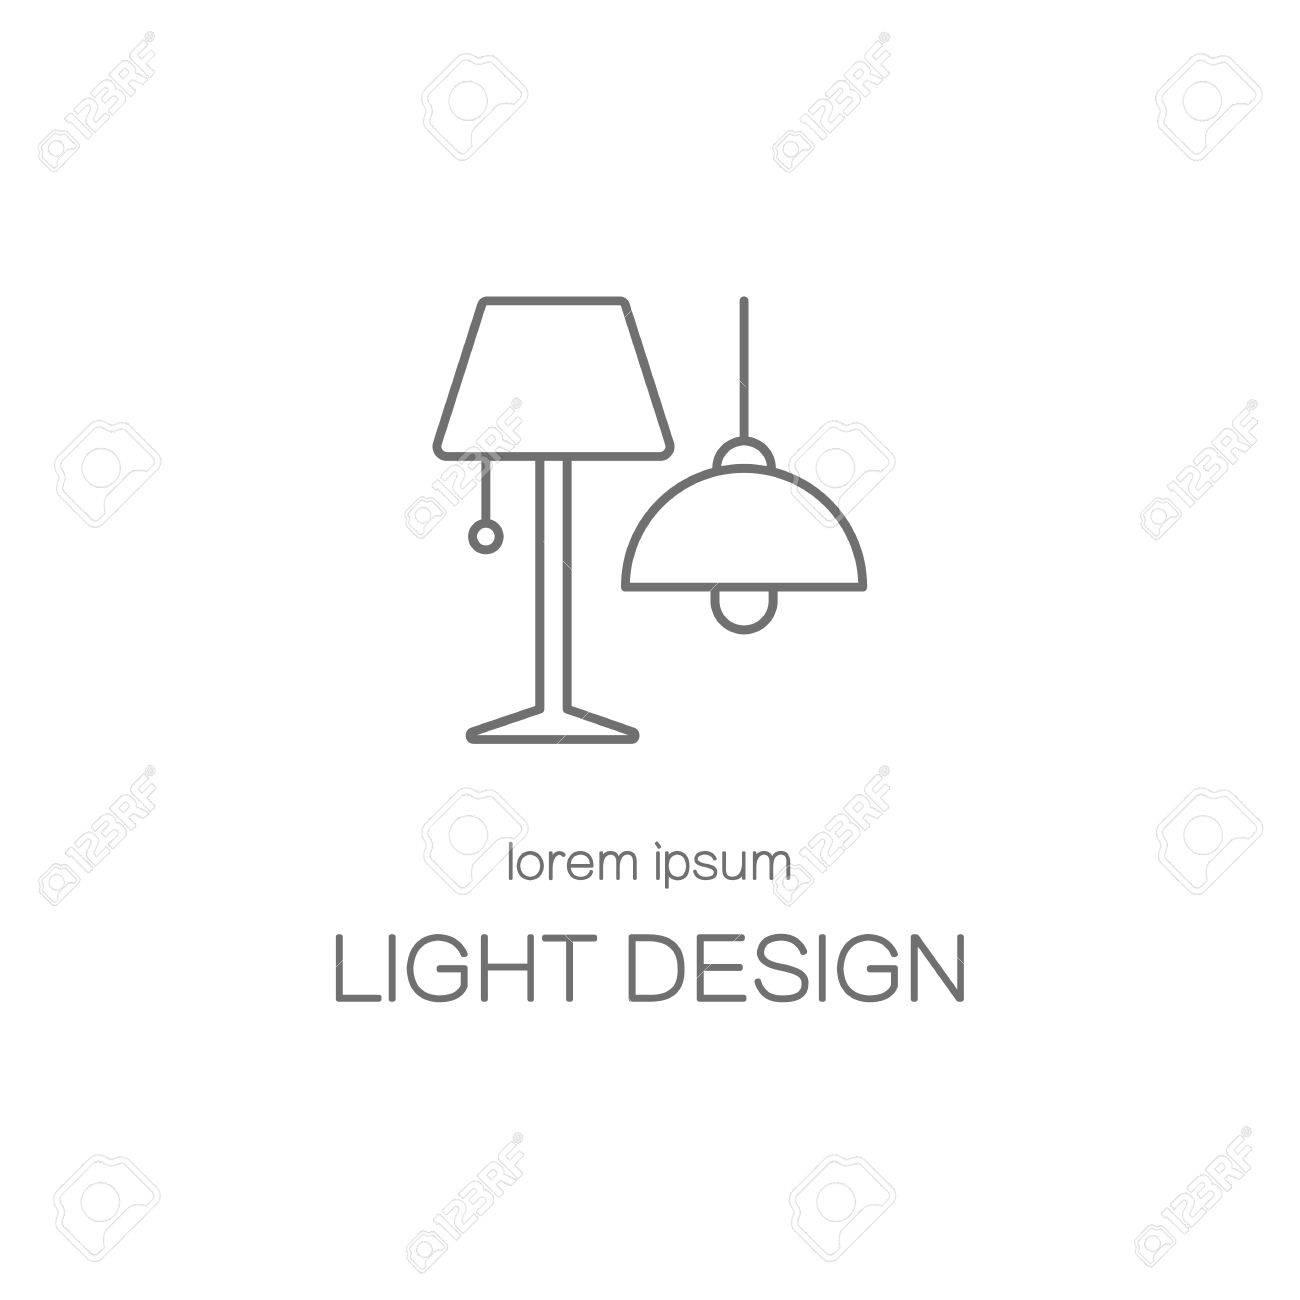 Light desigh house line icon logotype design templates. Modern easy to edit logo template. Vector logo design series. - 55945597